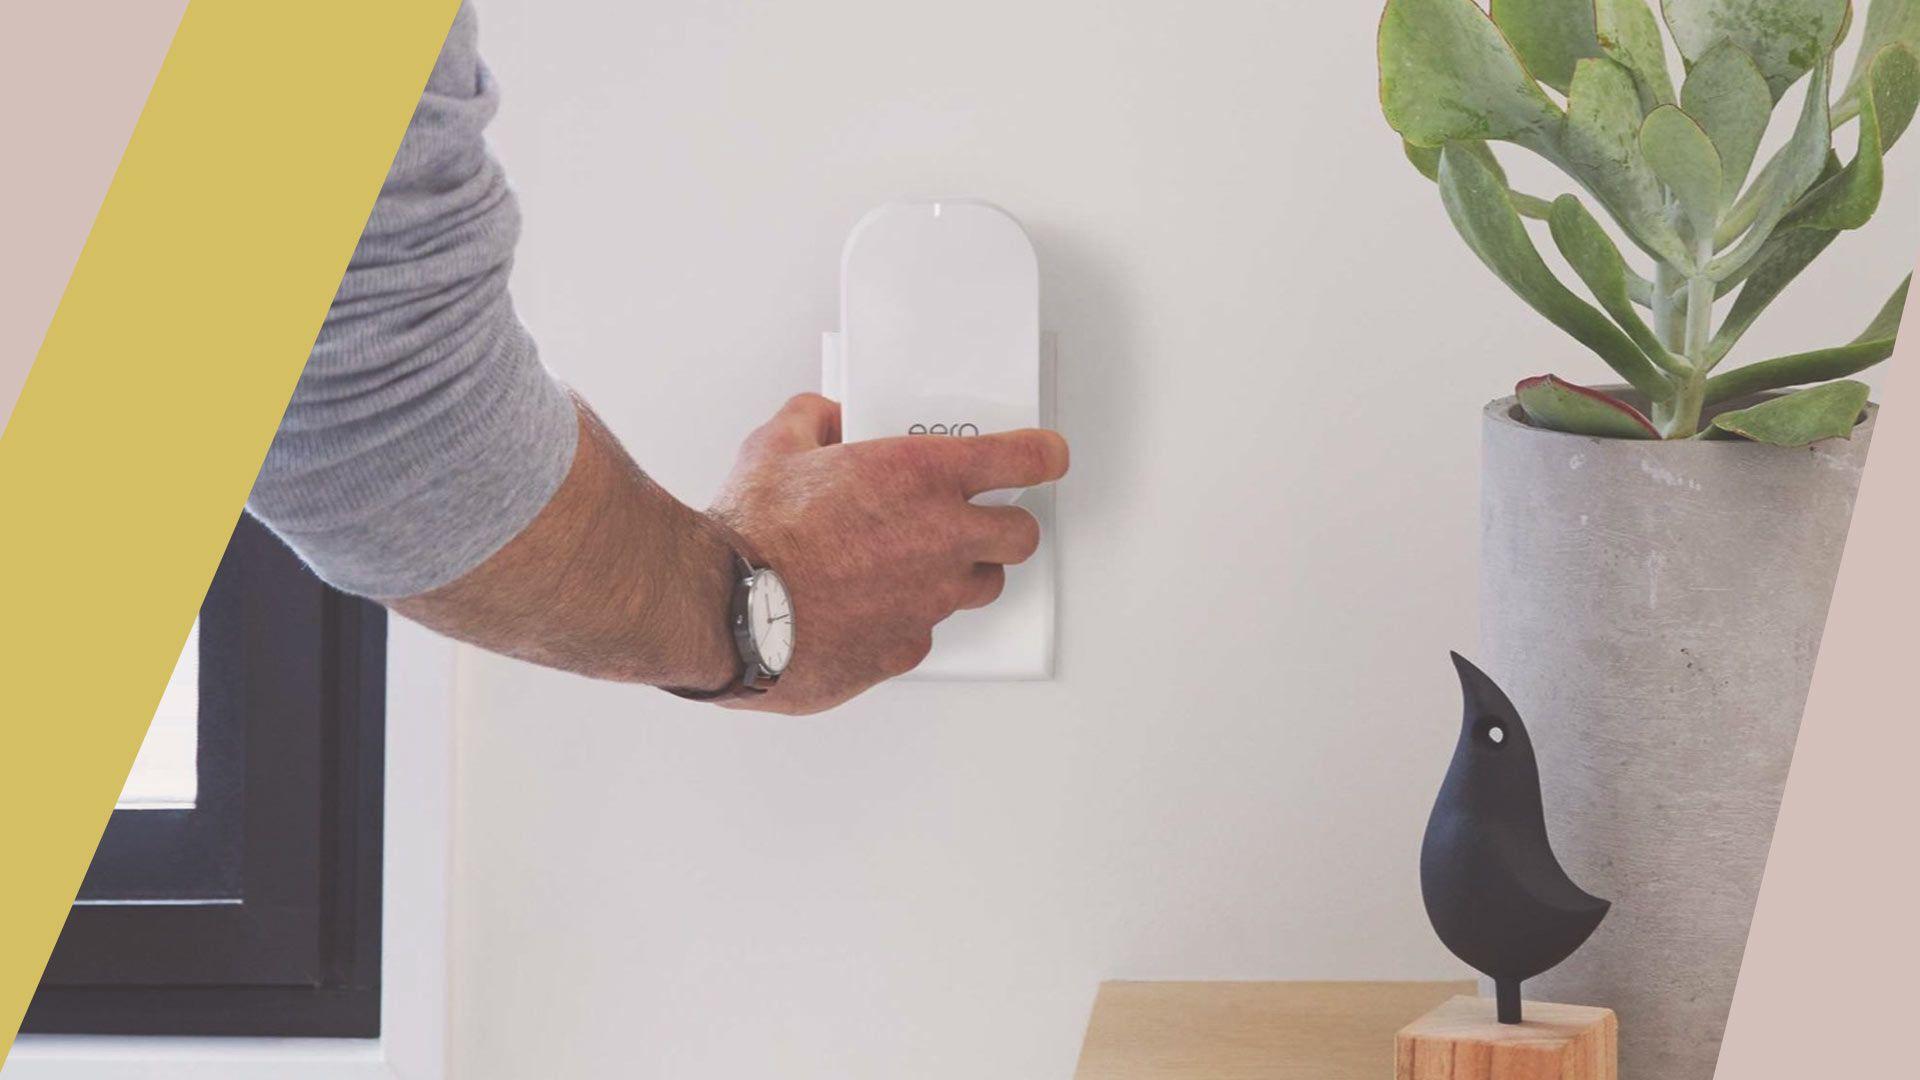 Amazon eero Pro mesh WiFi system ($299)